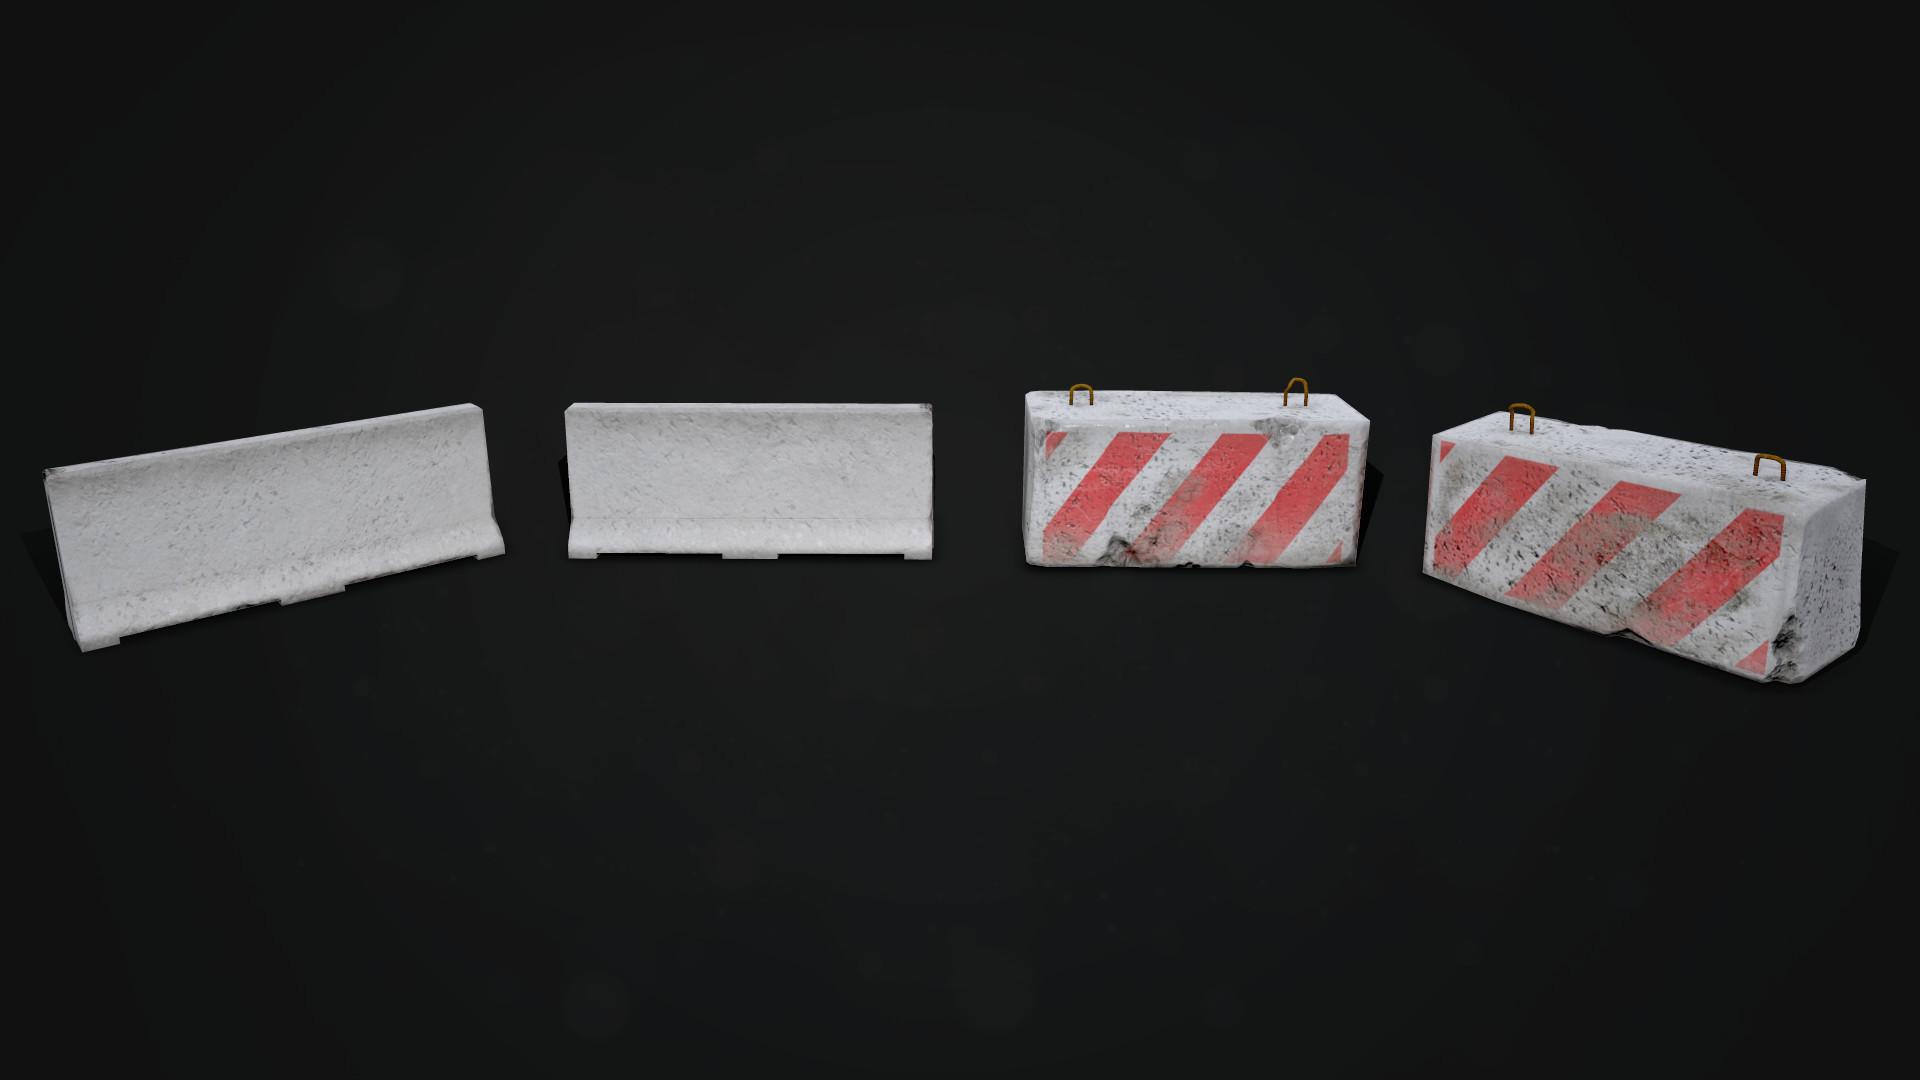 Christoffer sjostrom concreteroadblocks2